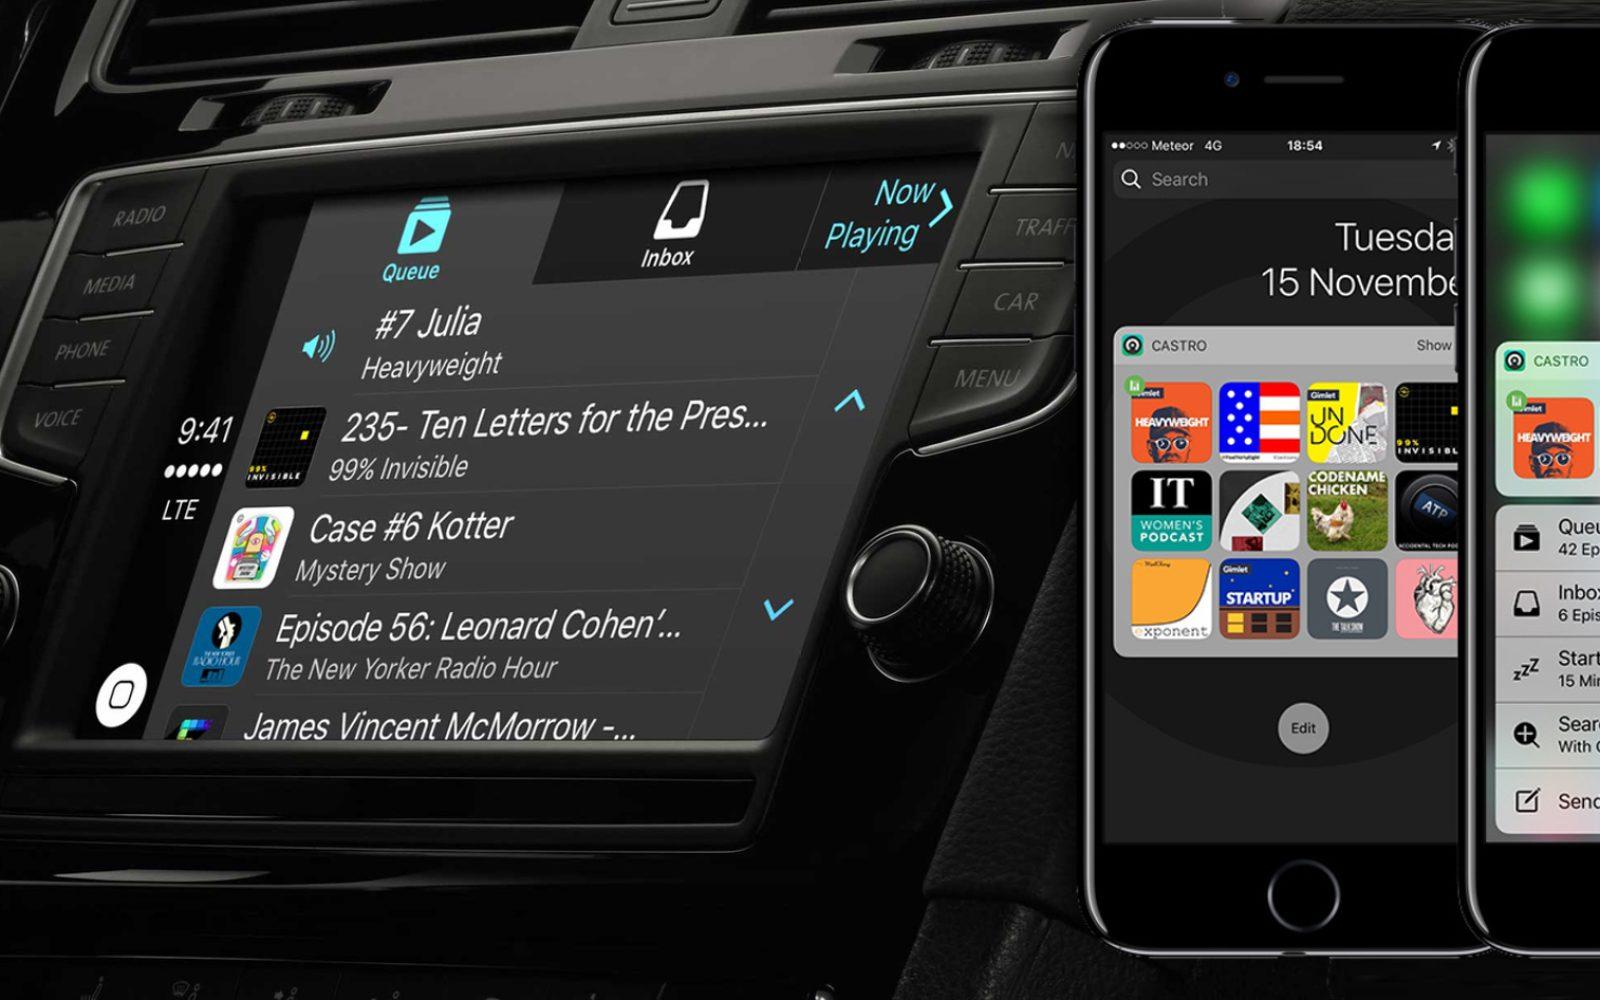 Castro podcast player app adds CarPlay, iOS 10 widget, 3D